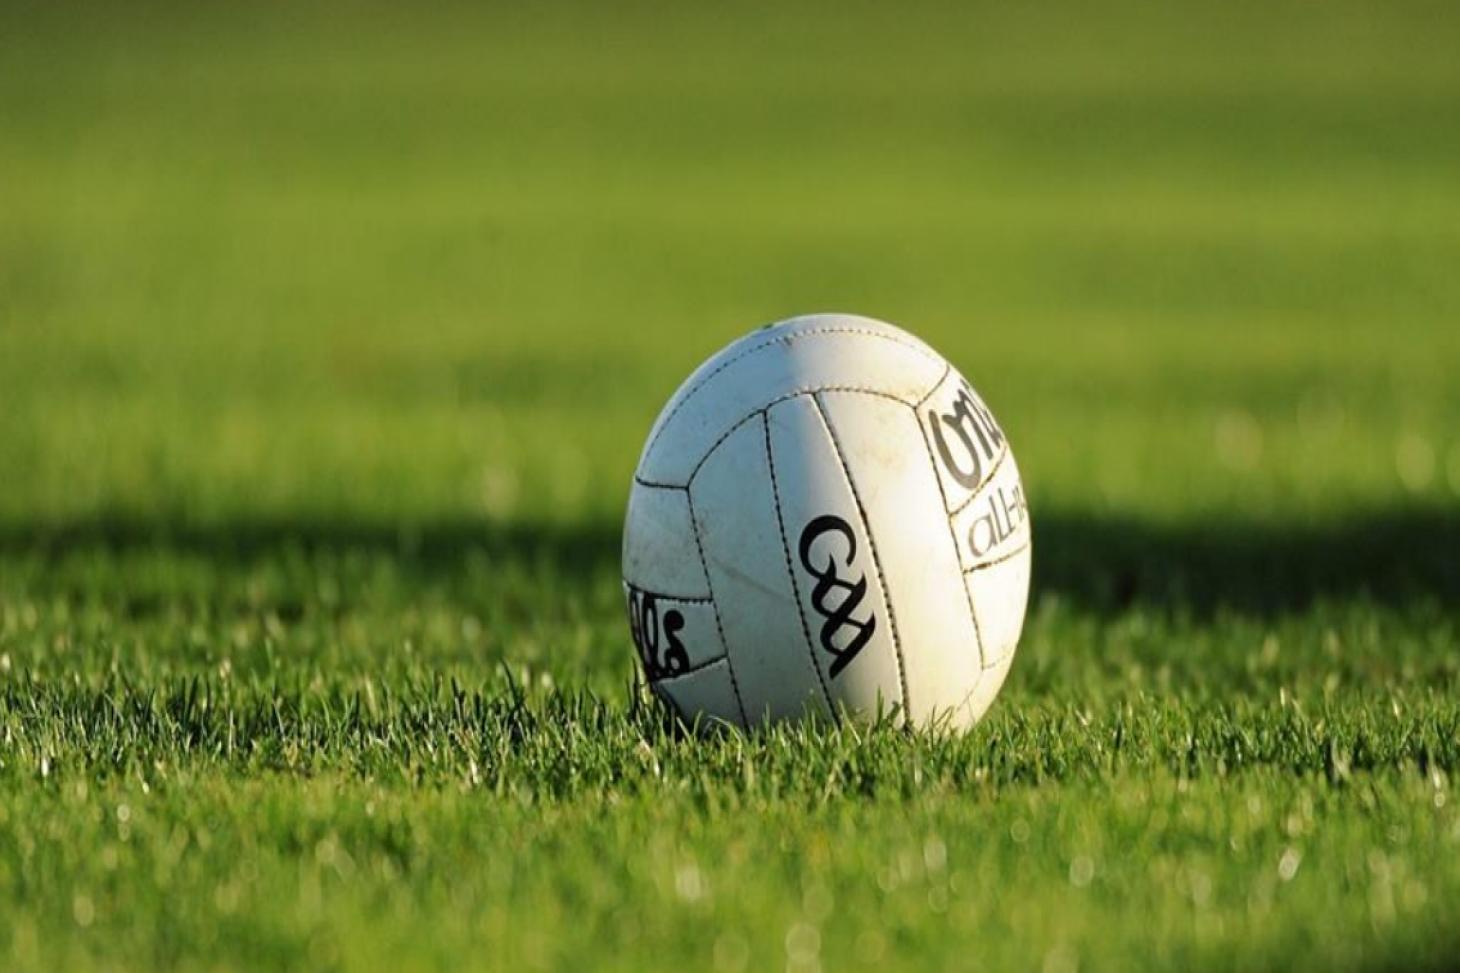 Raheny GAA Club Full size | Grass gaa pitch